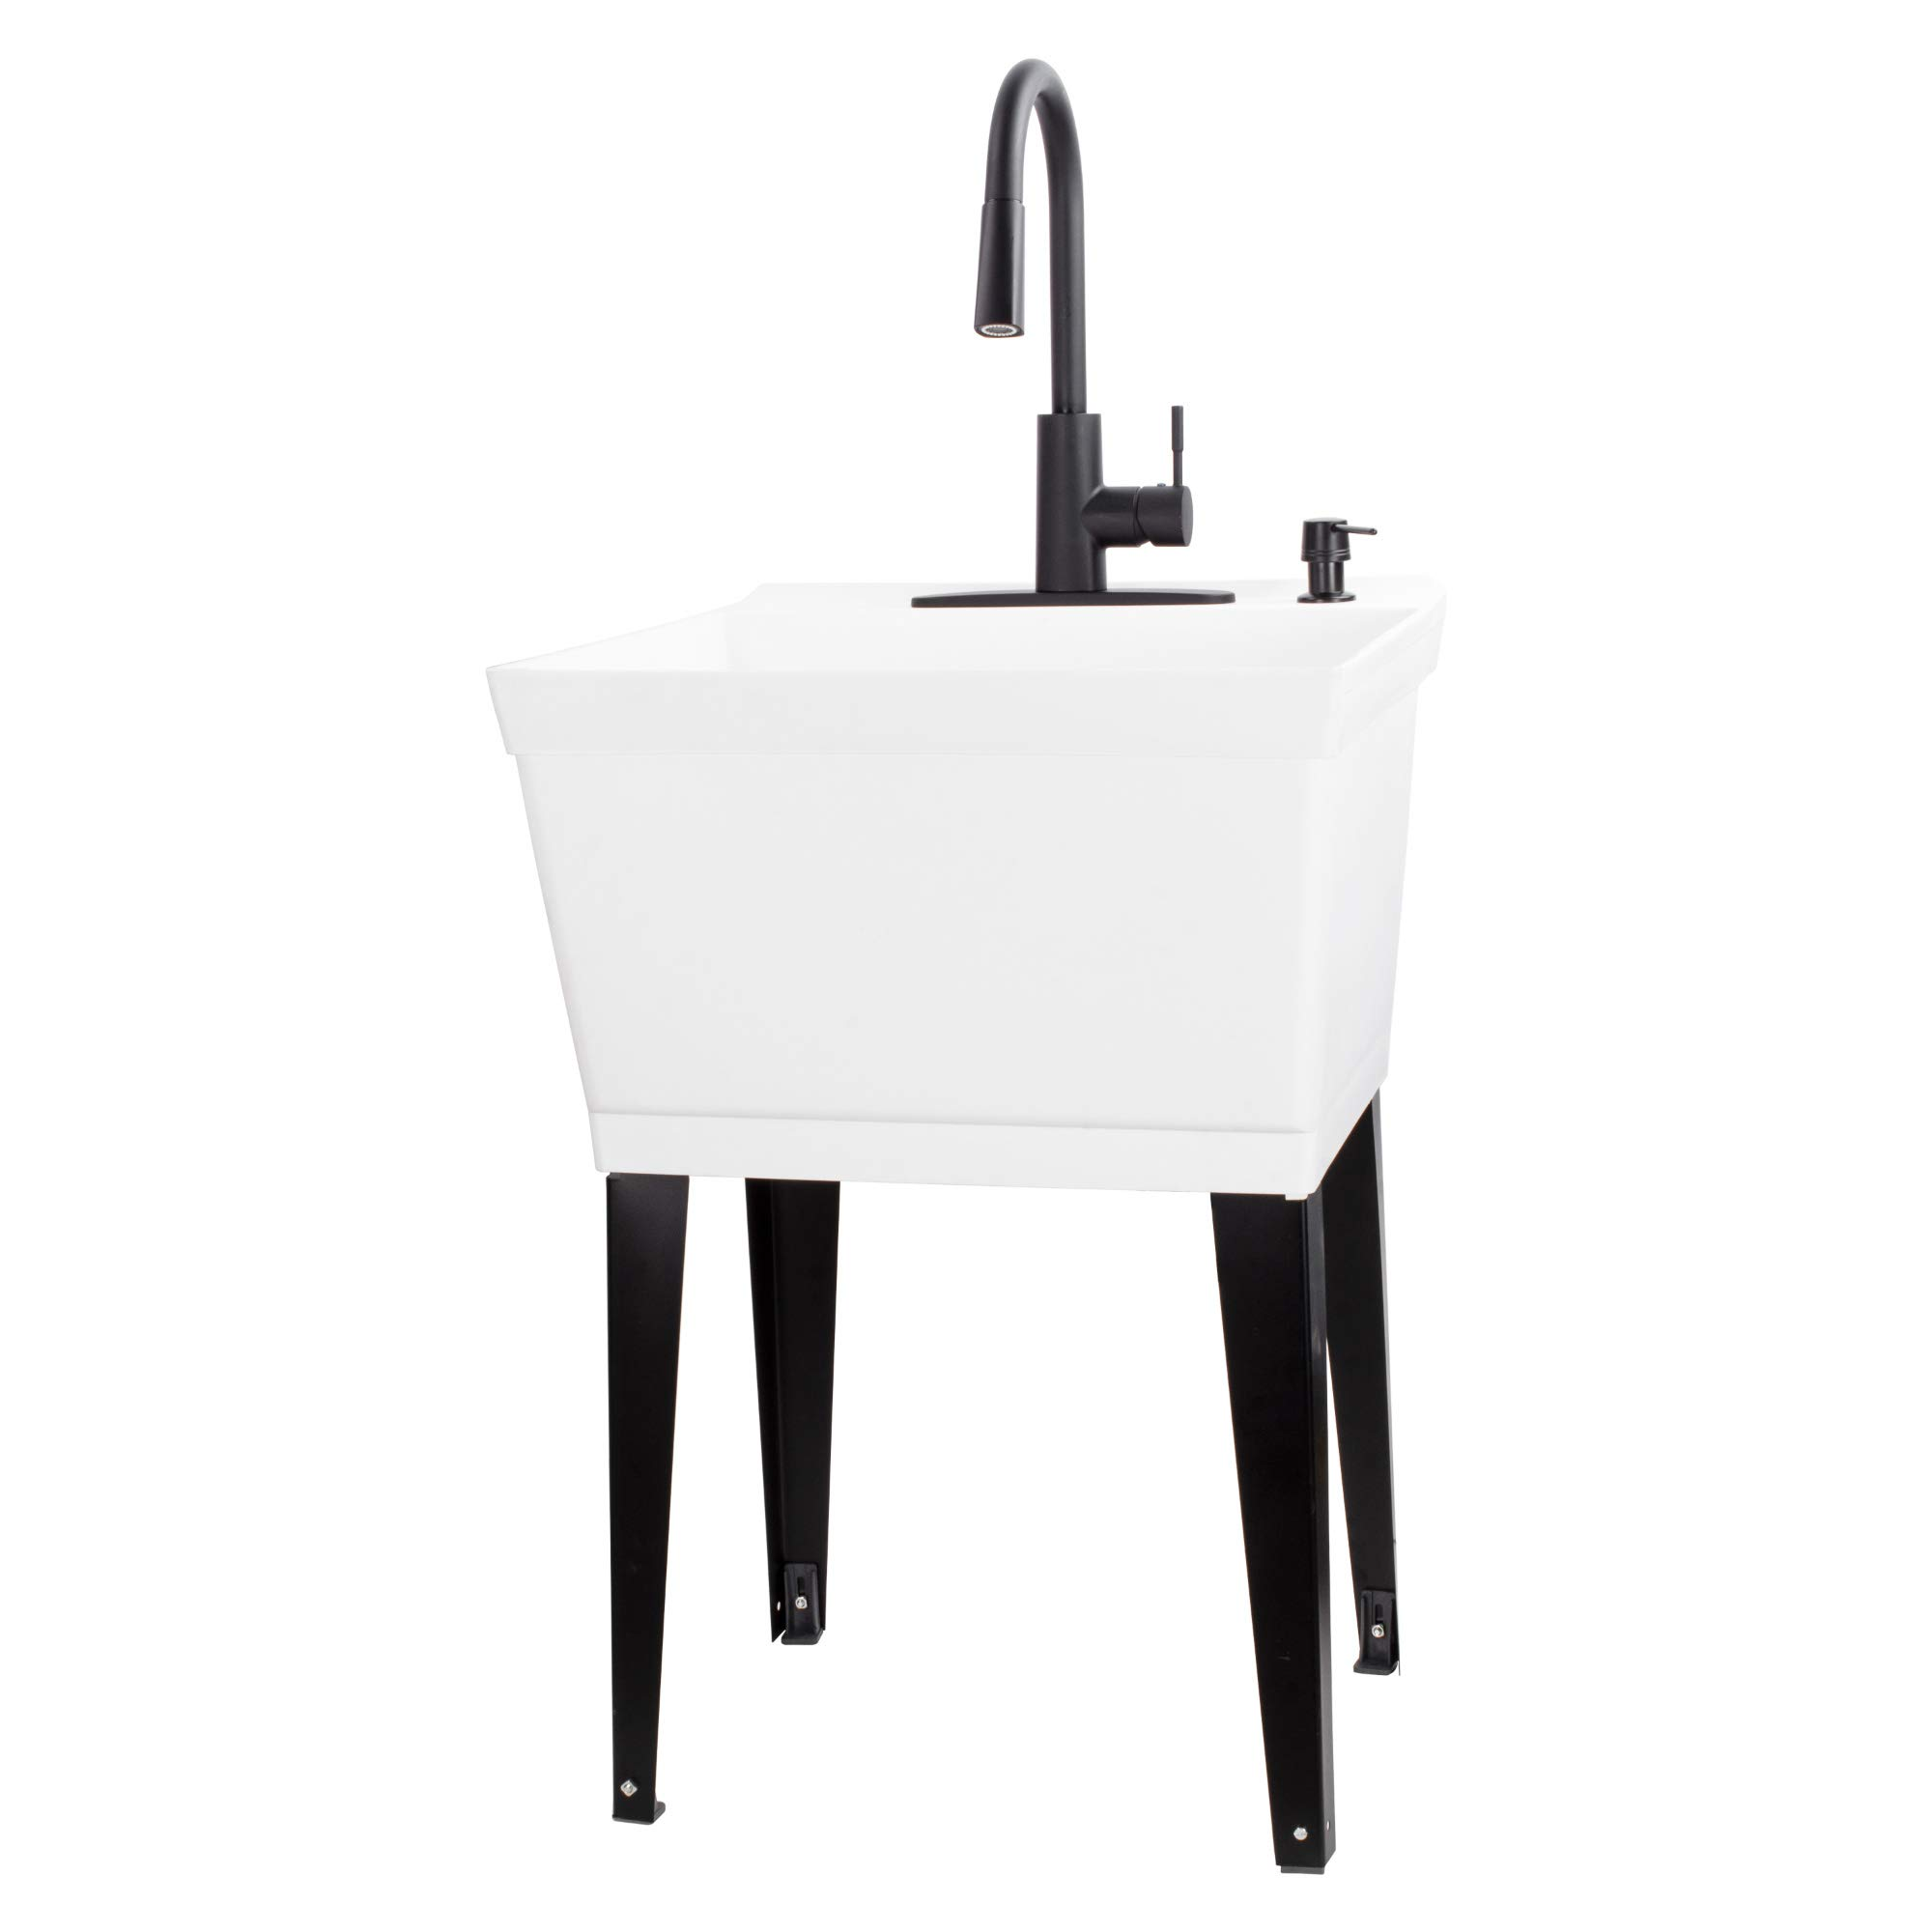 VETTA Utility Laundry Kitchen Faucet